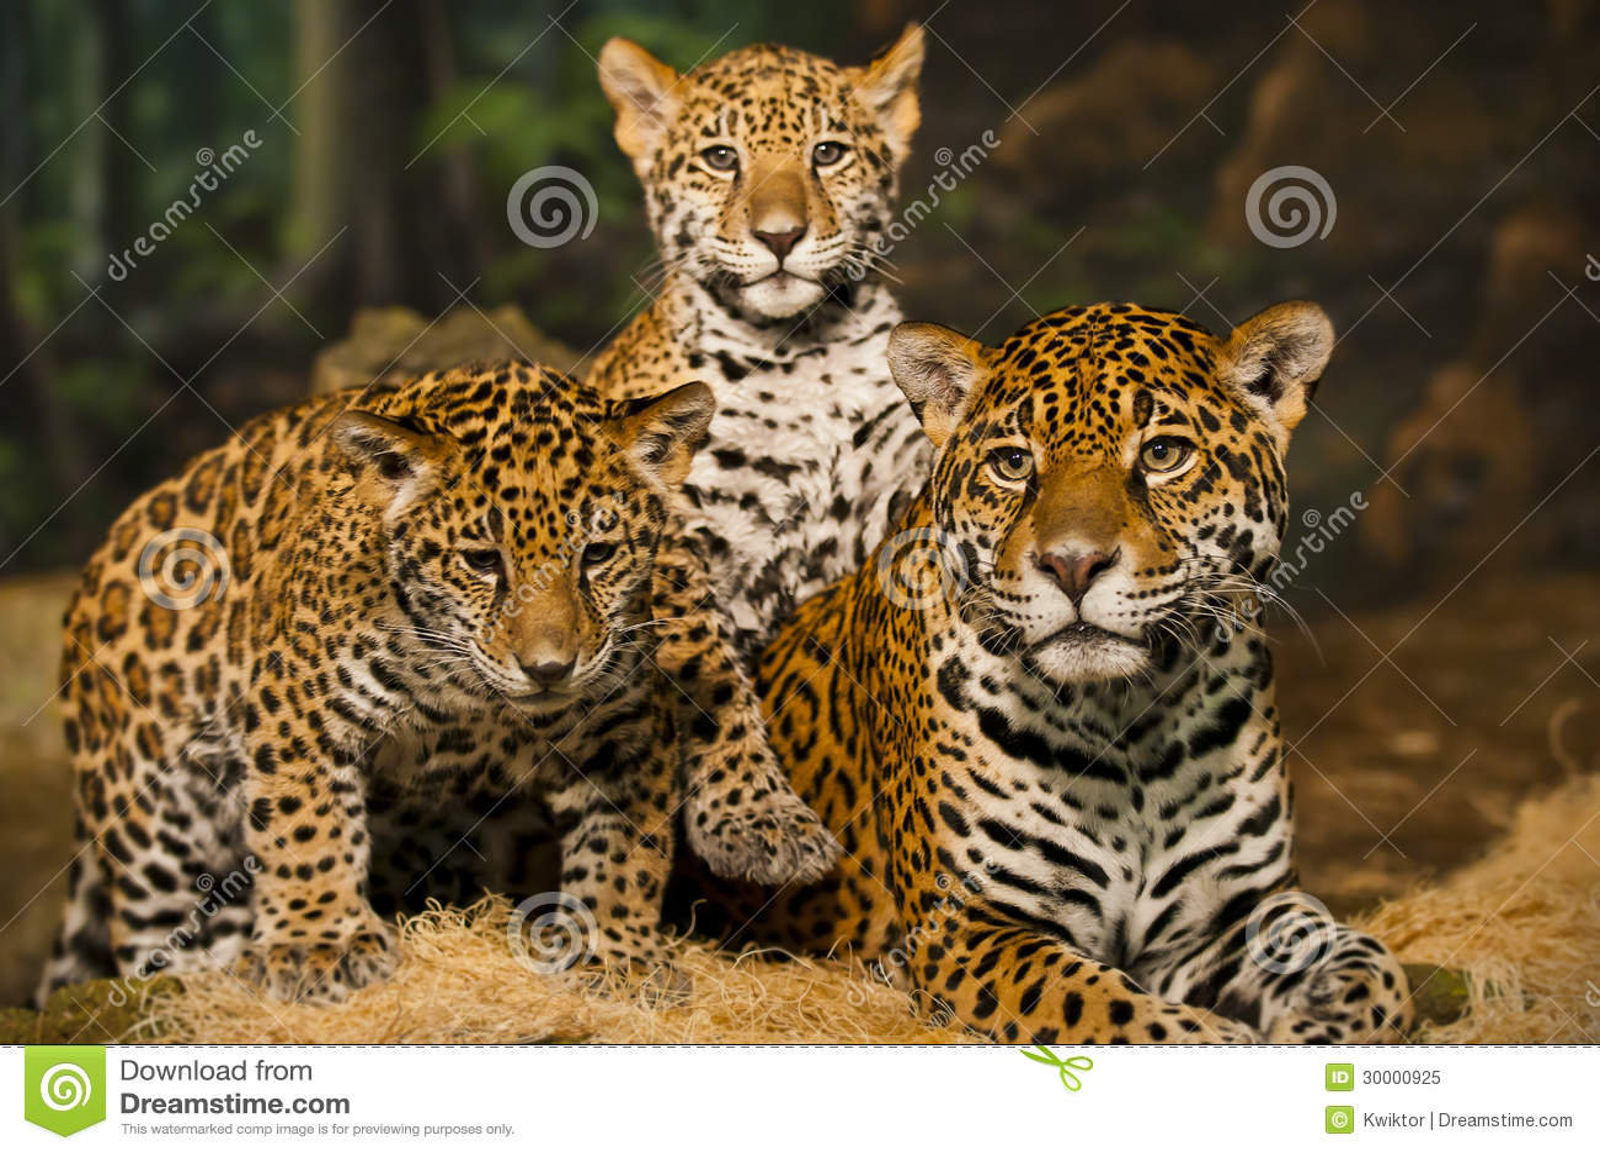 Jaguar Family Stock Image Image Of Front Eyes Feline